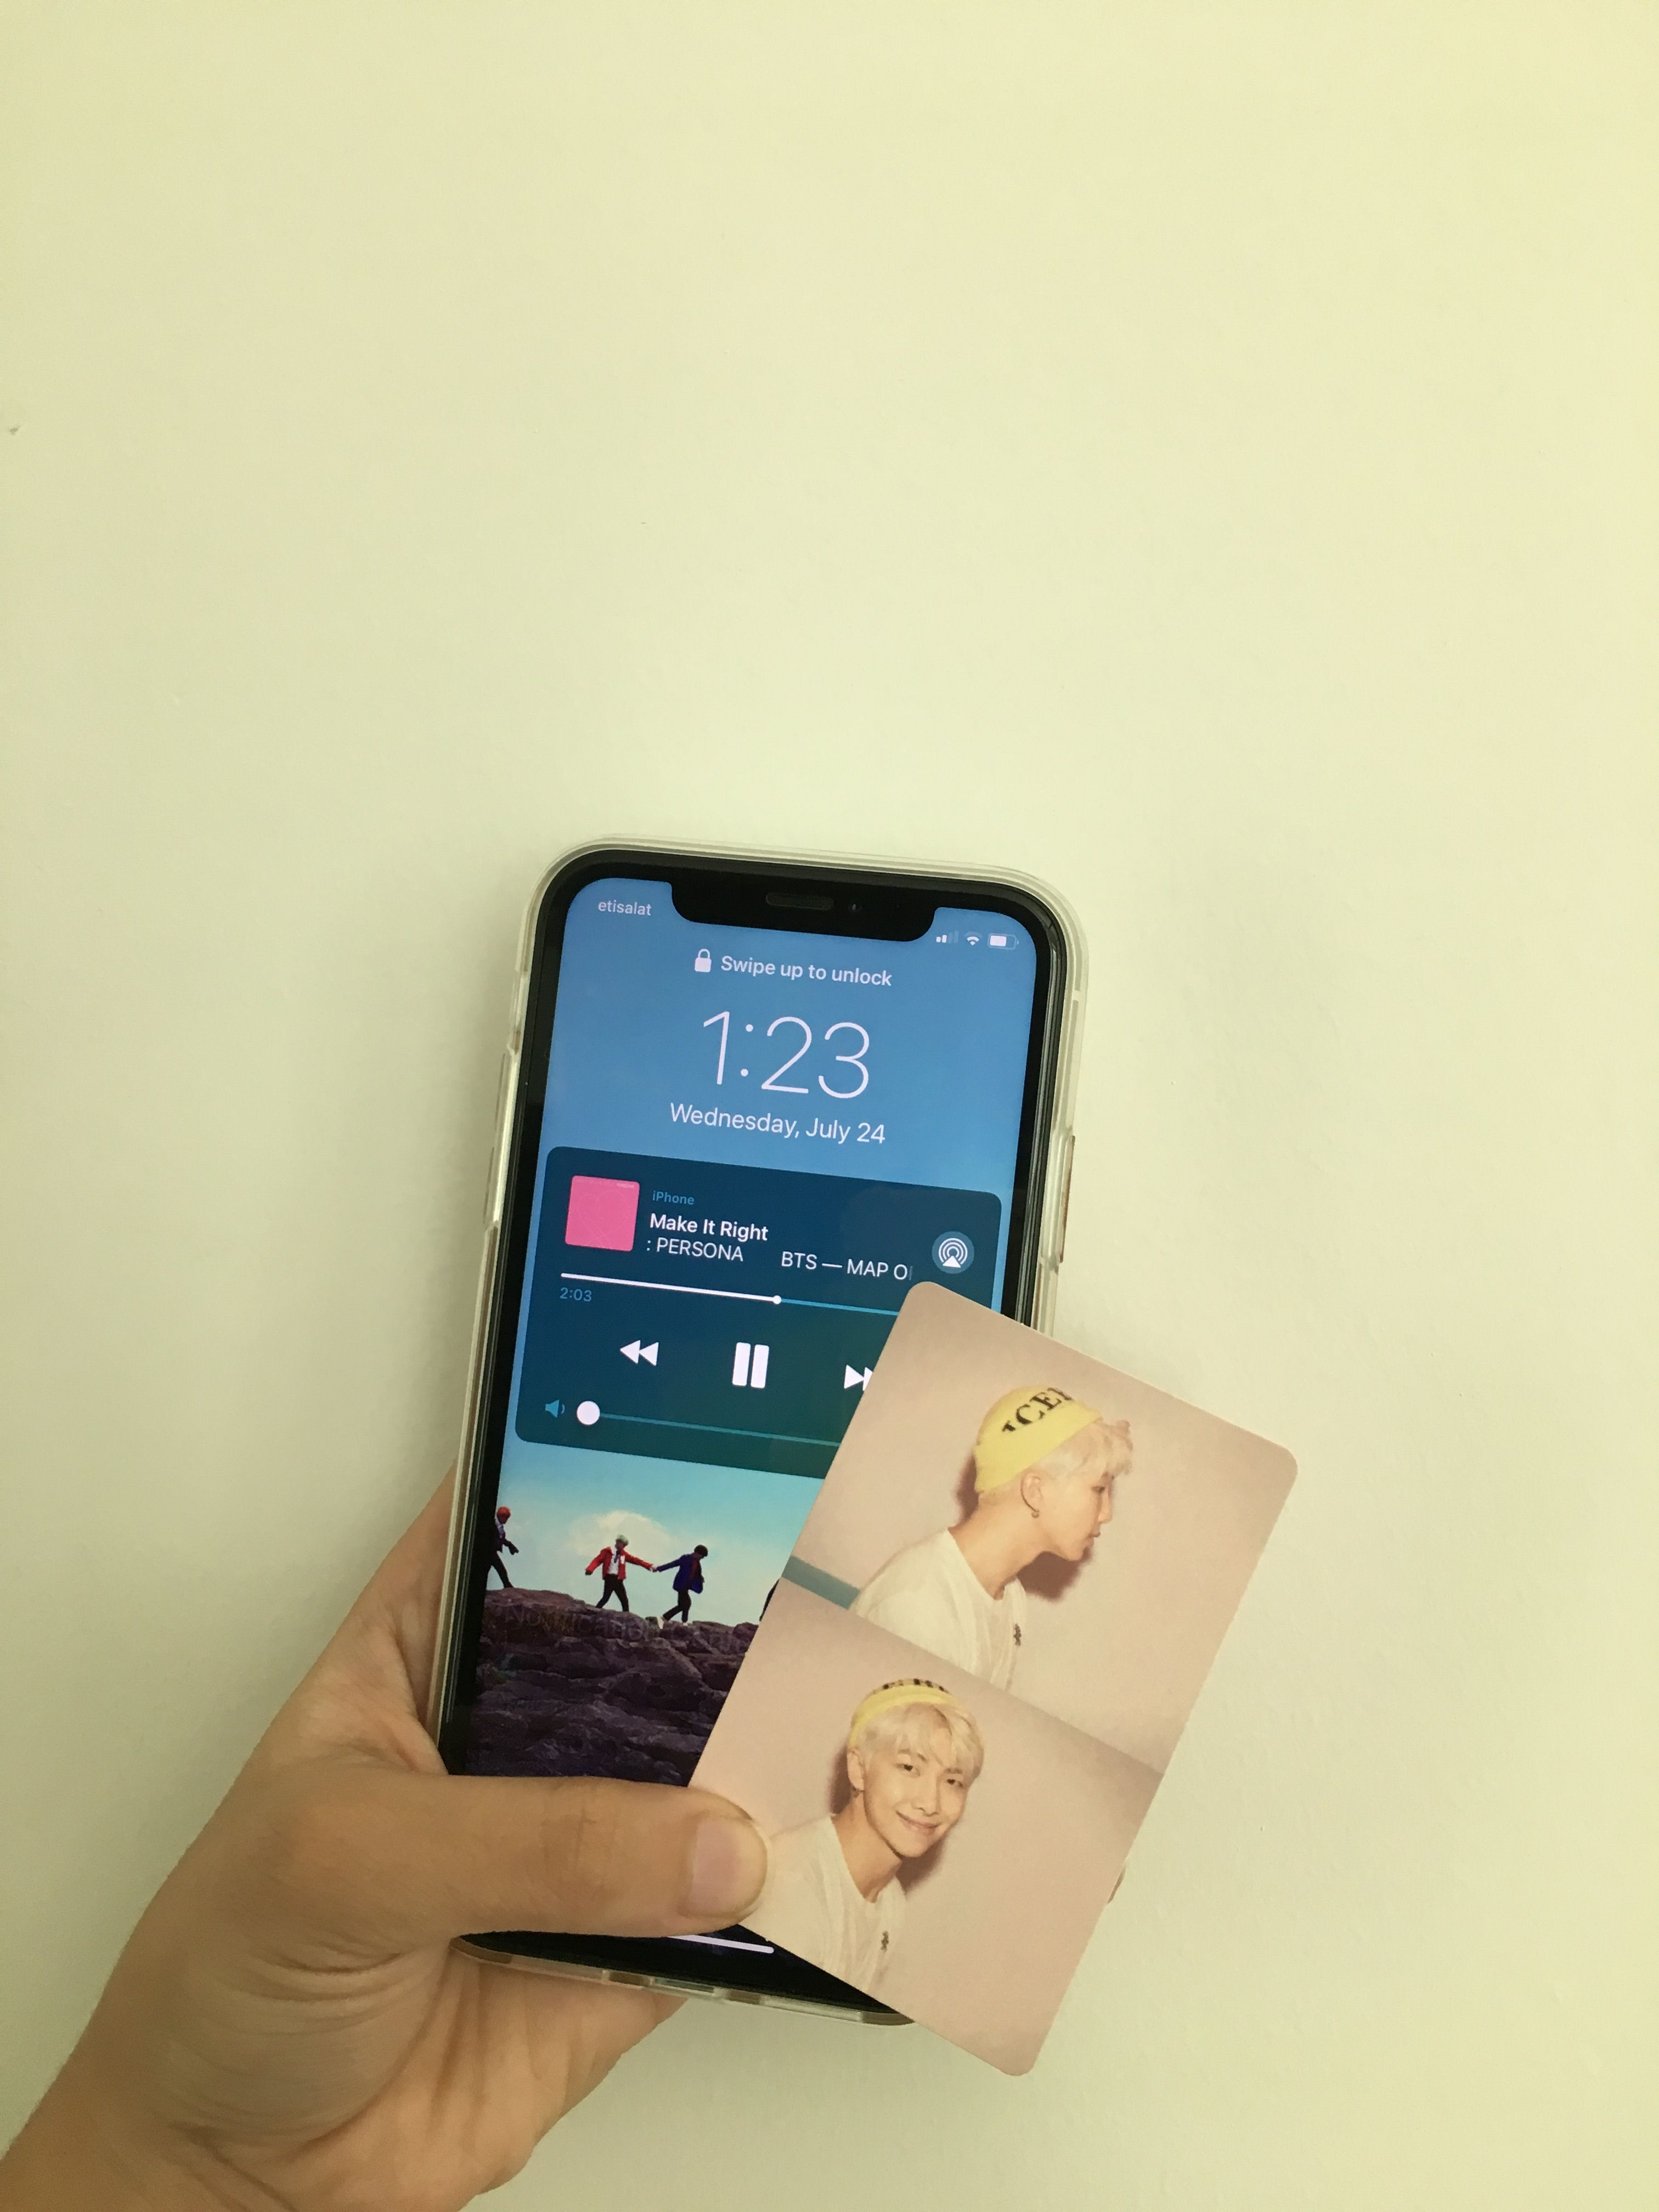 iPhone XR aesthetics case Kpop phone cases, Aesthetic